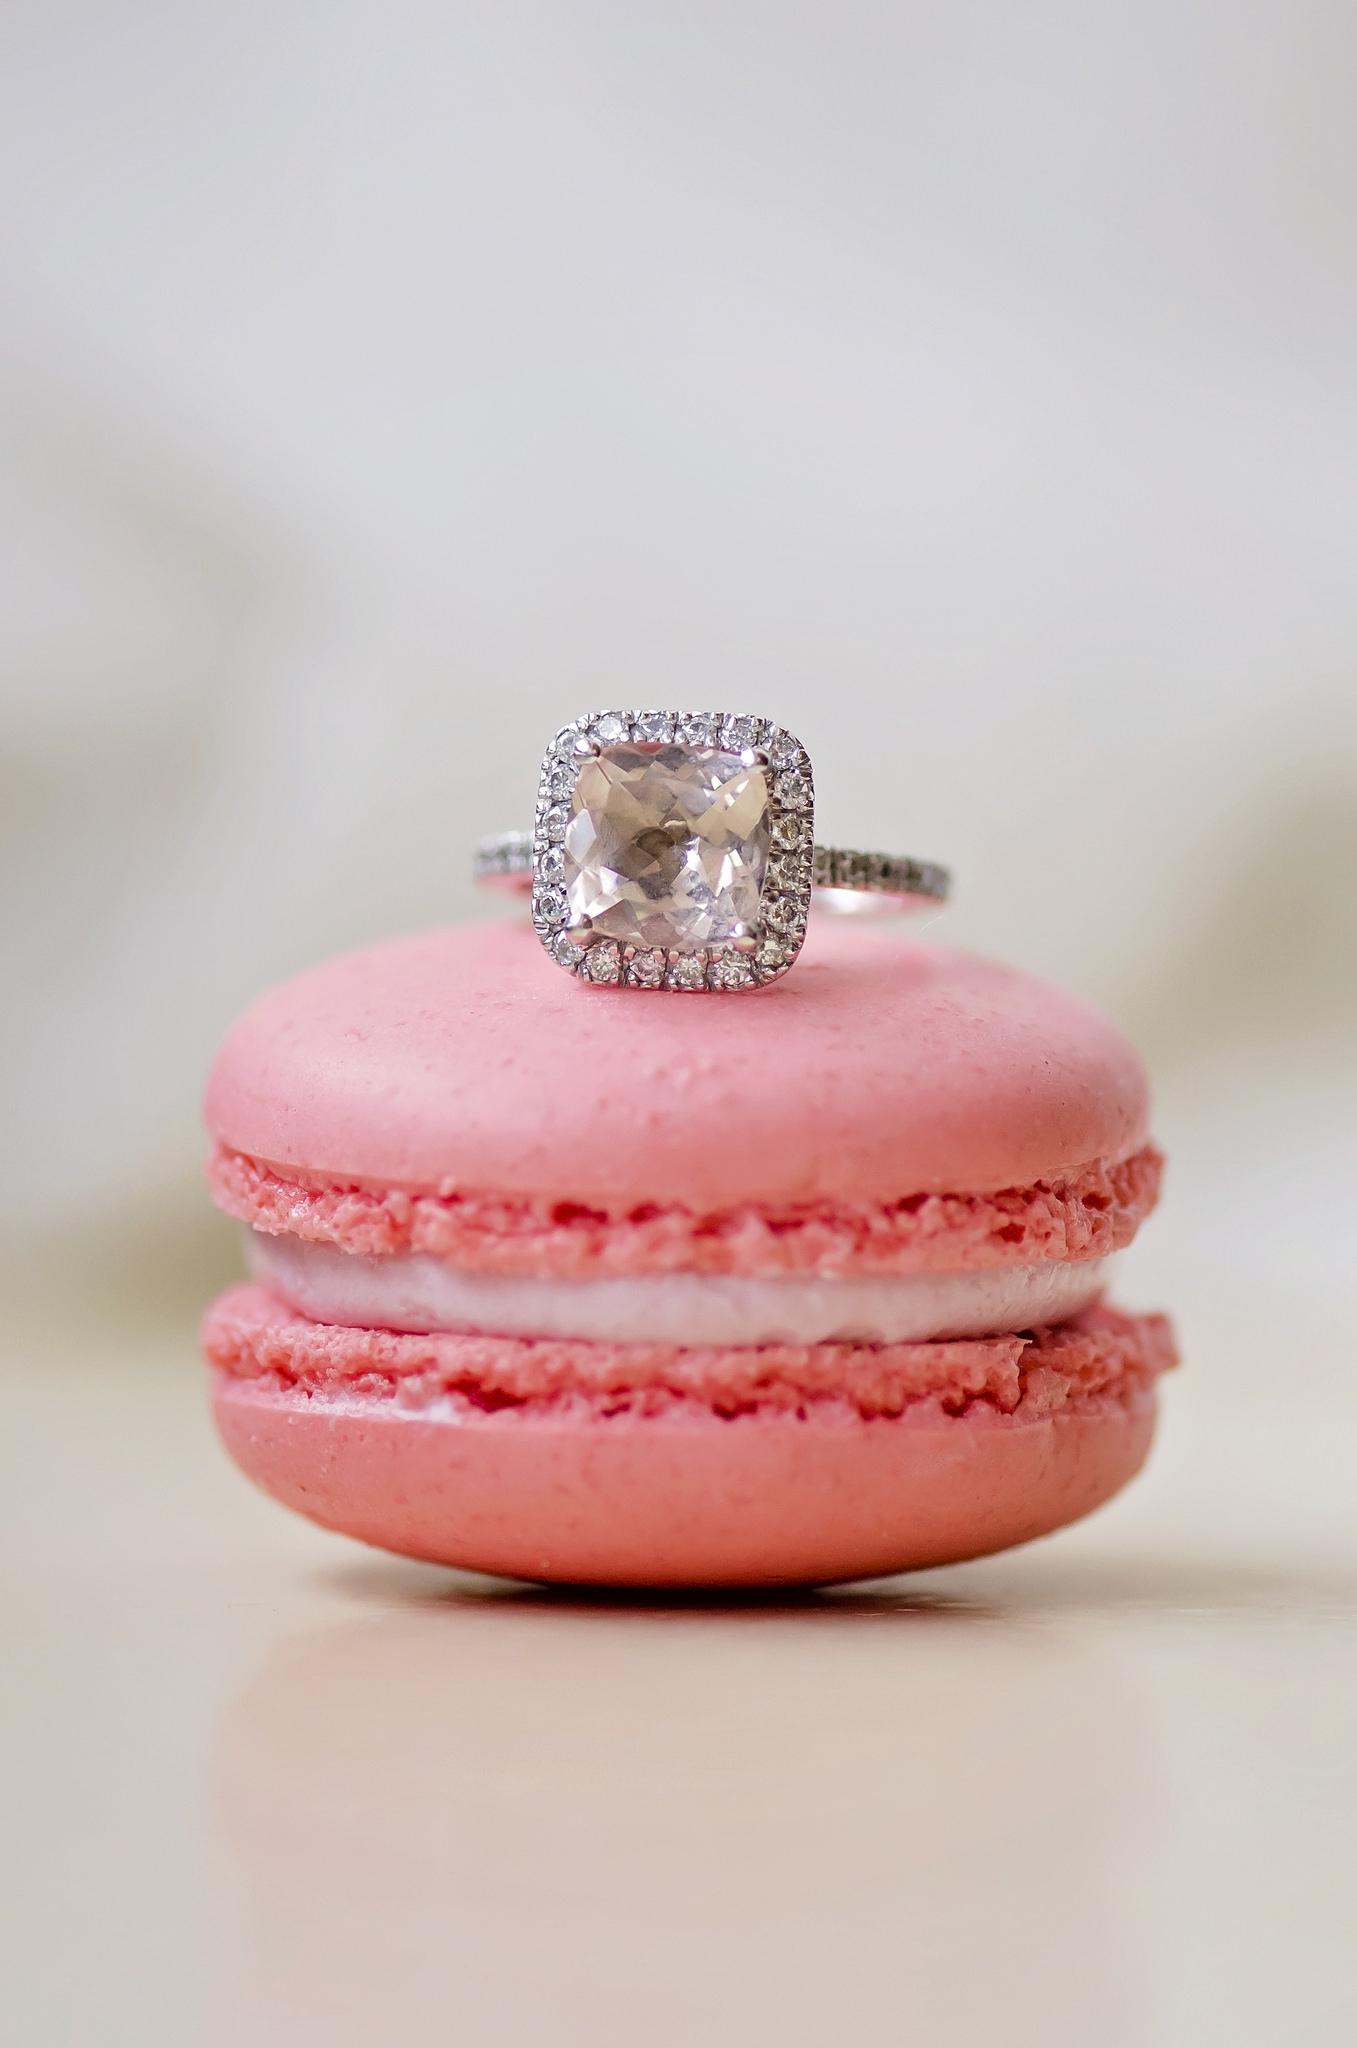 kristine_wedding_rings_spiritedtable_photo17.jpg